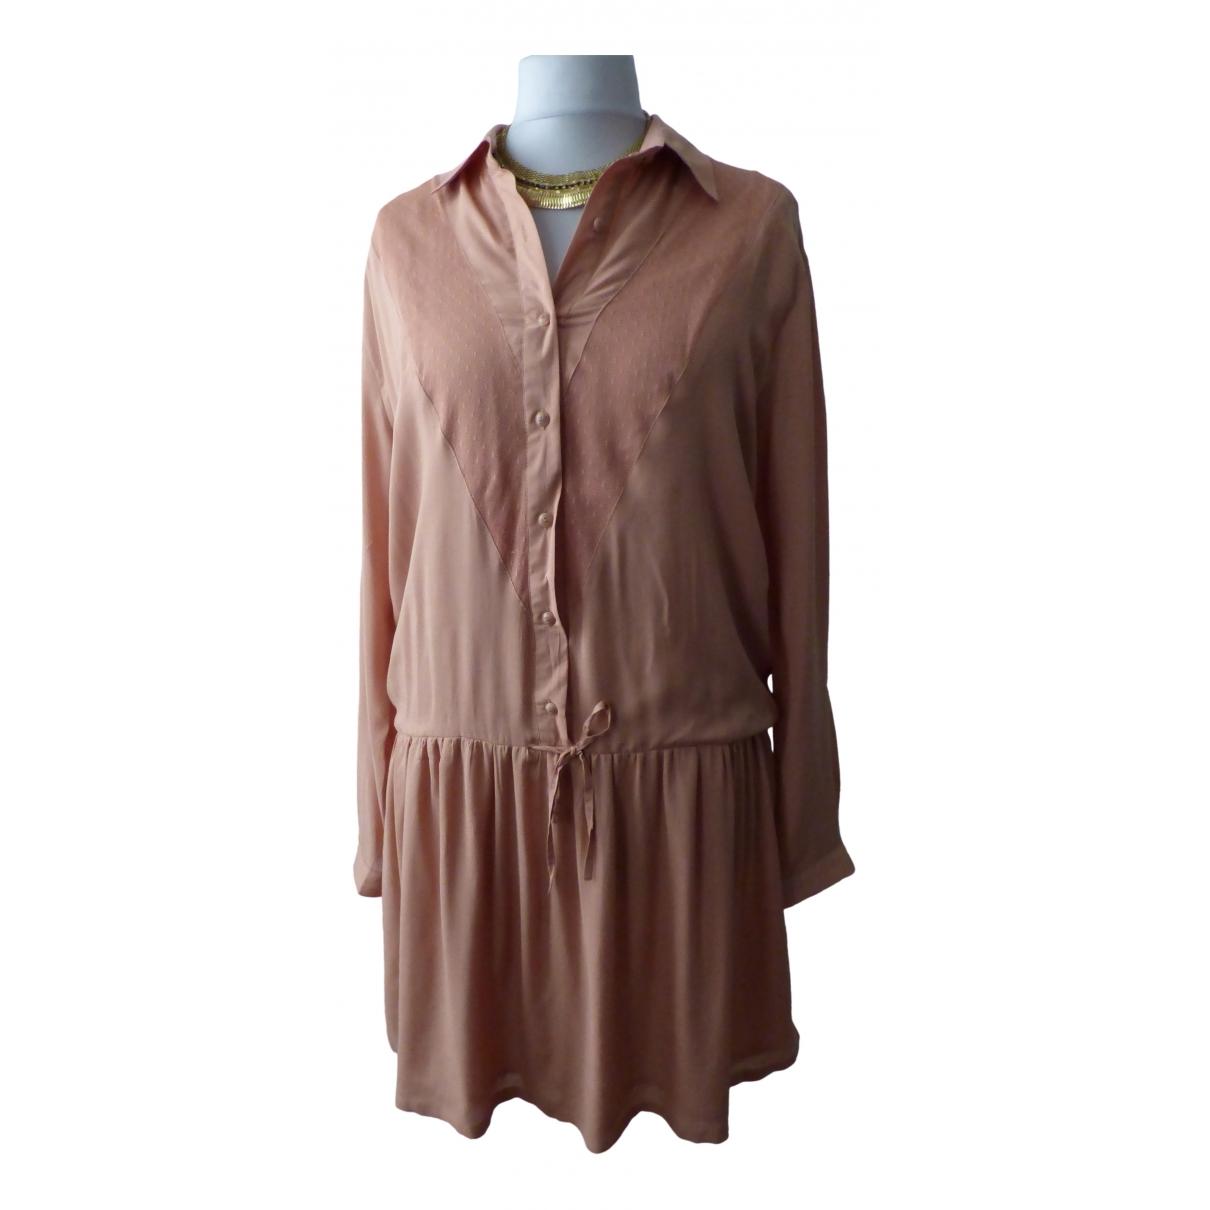 Bel Air \N Pink dress for Women 2 0-5